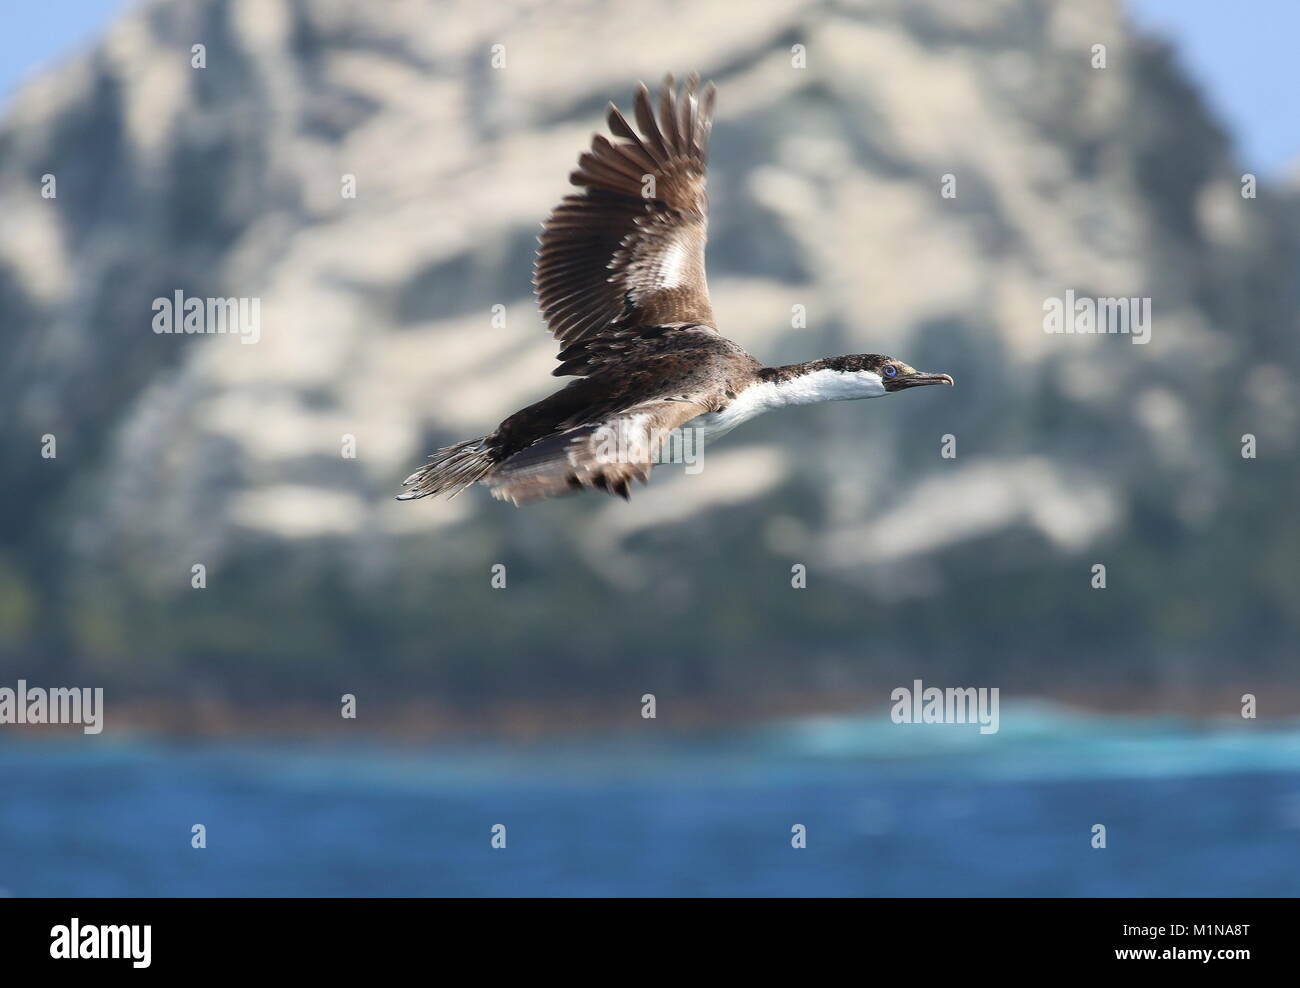 South Atlantic bird life - Stock Image